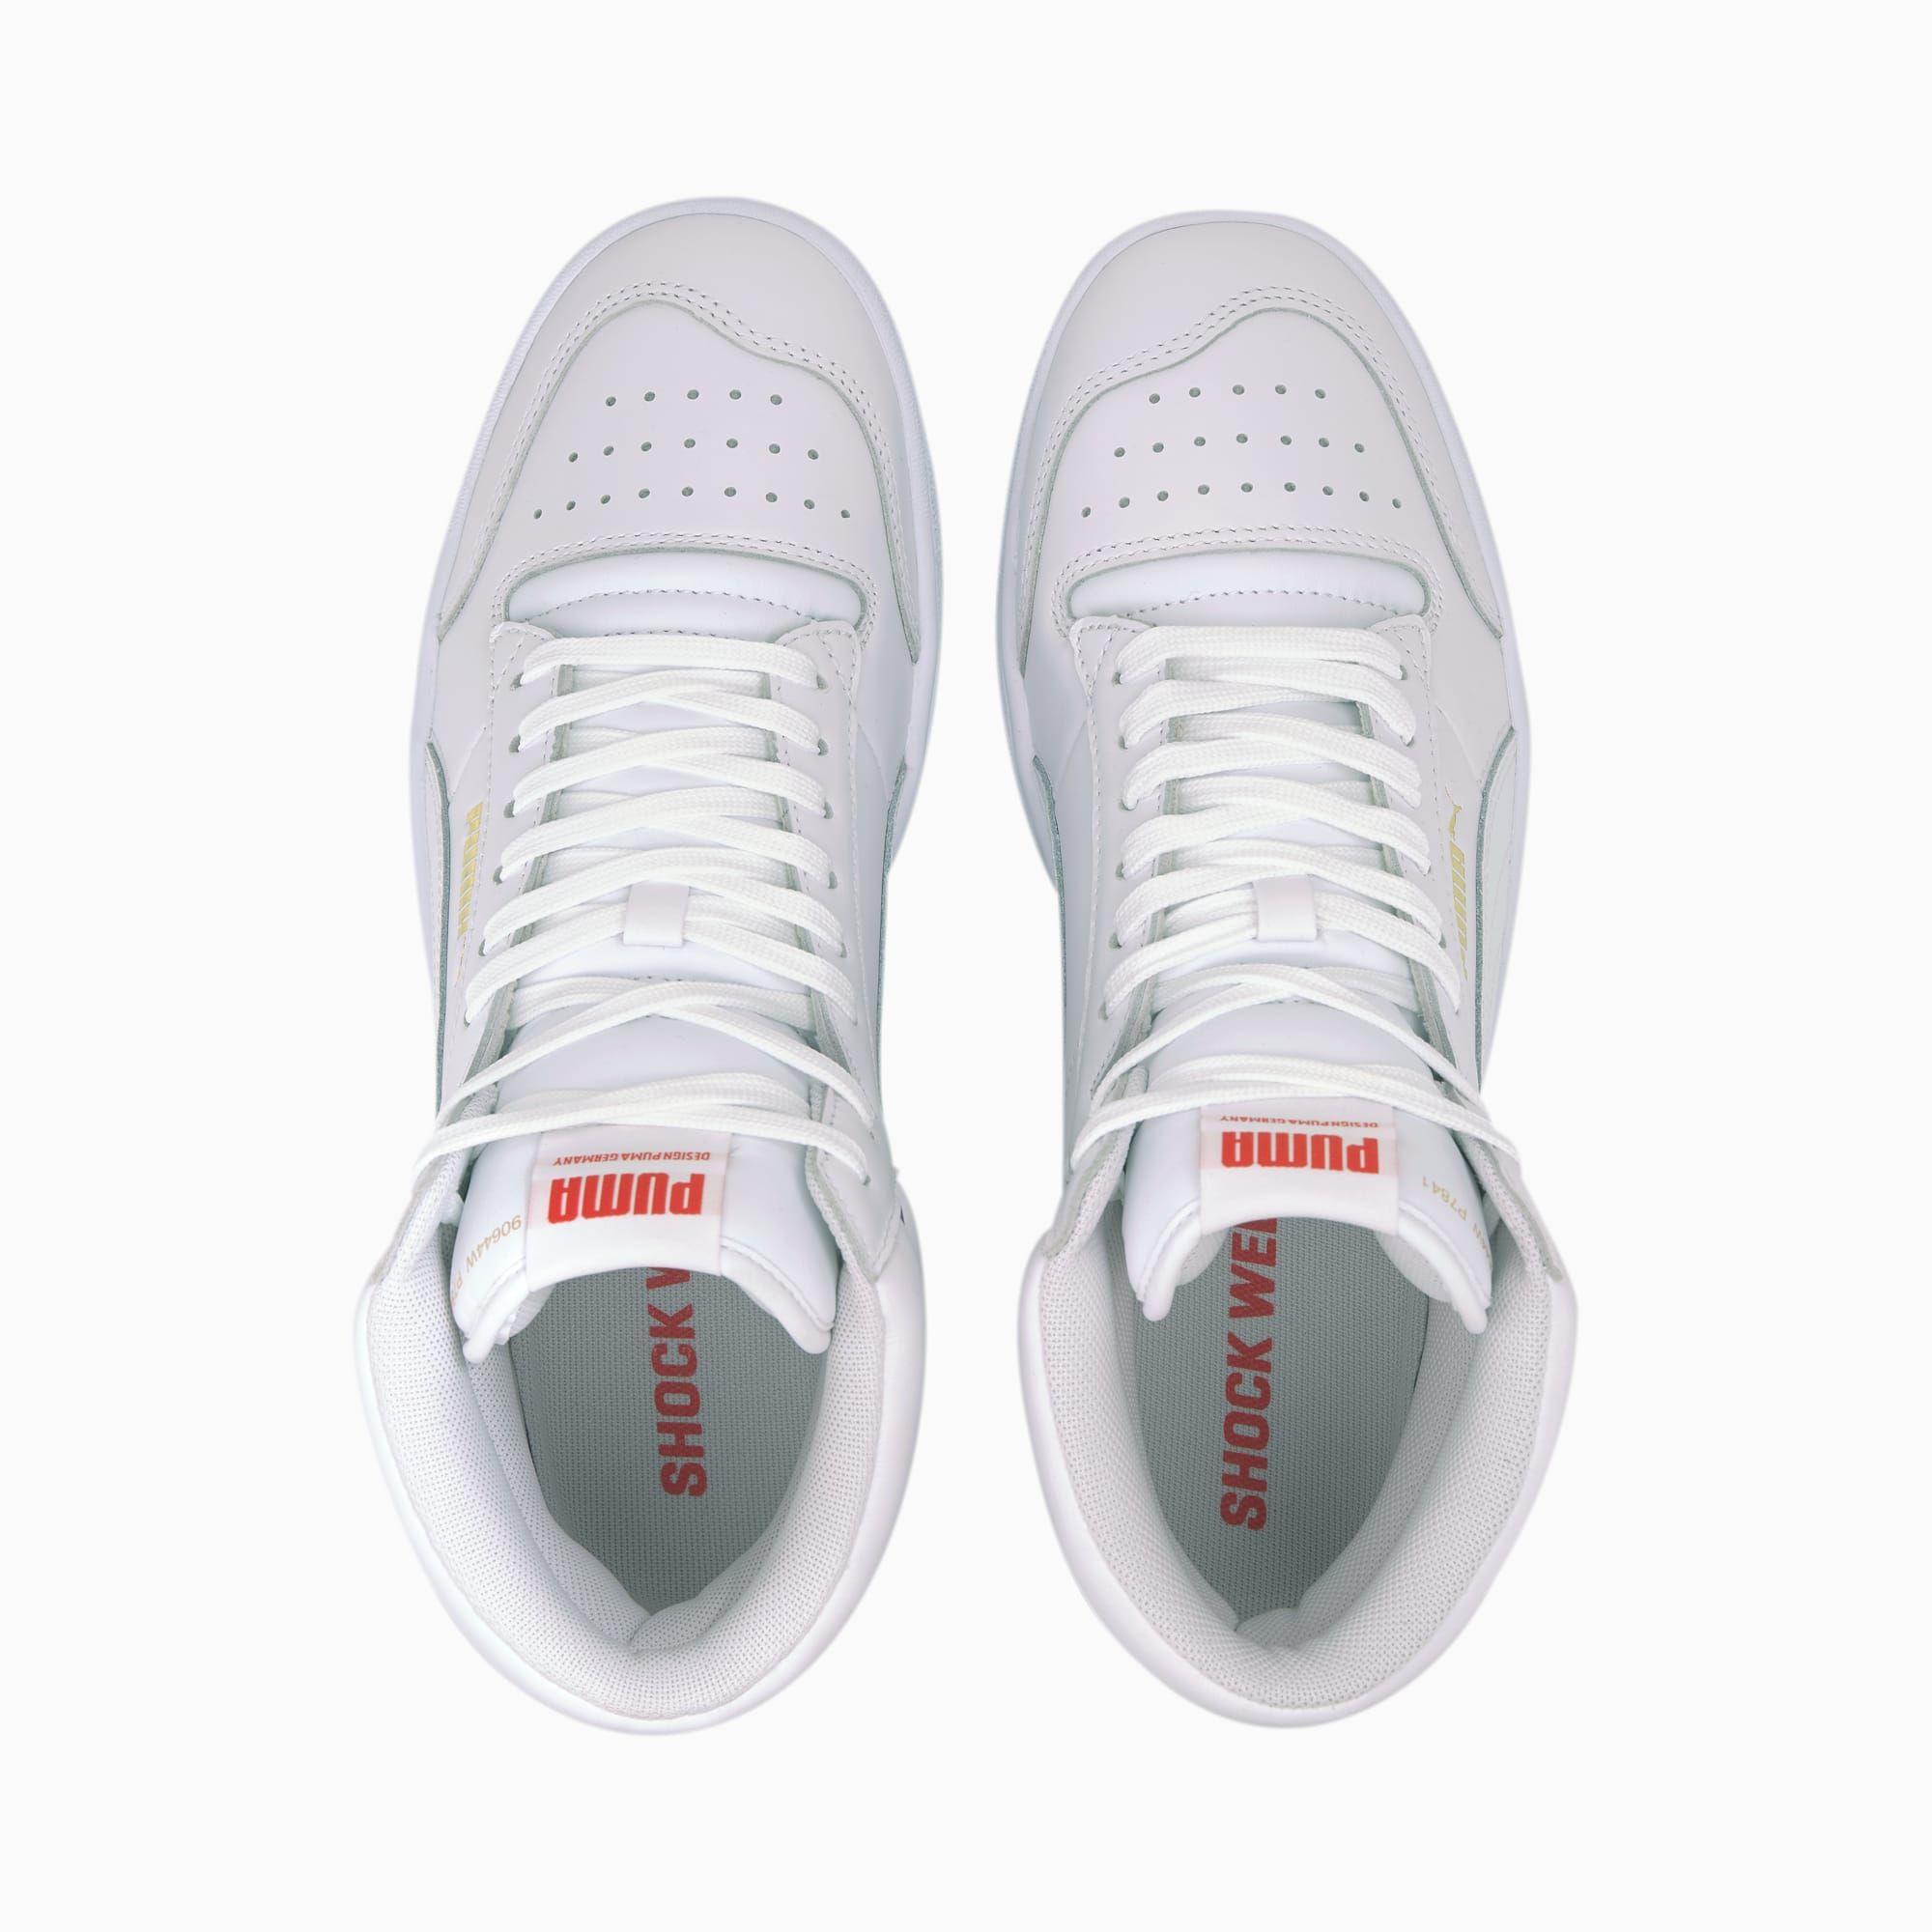 Men's PUMA Ralph Sampson Mid Trainers, White/Hirisrd/Purplcoralites, size 10.5, Shoes